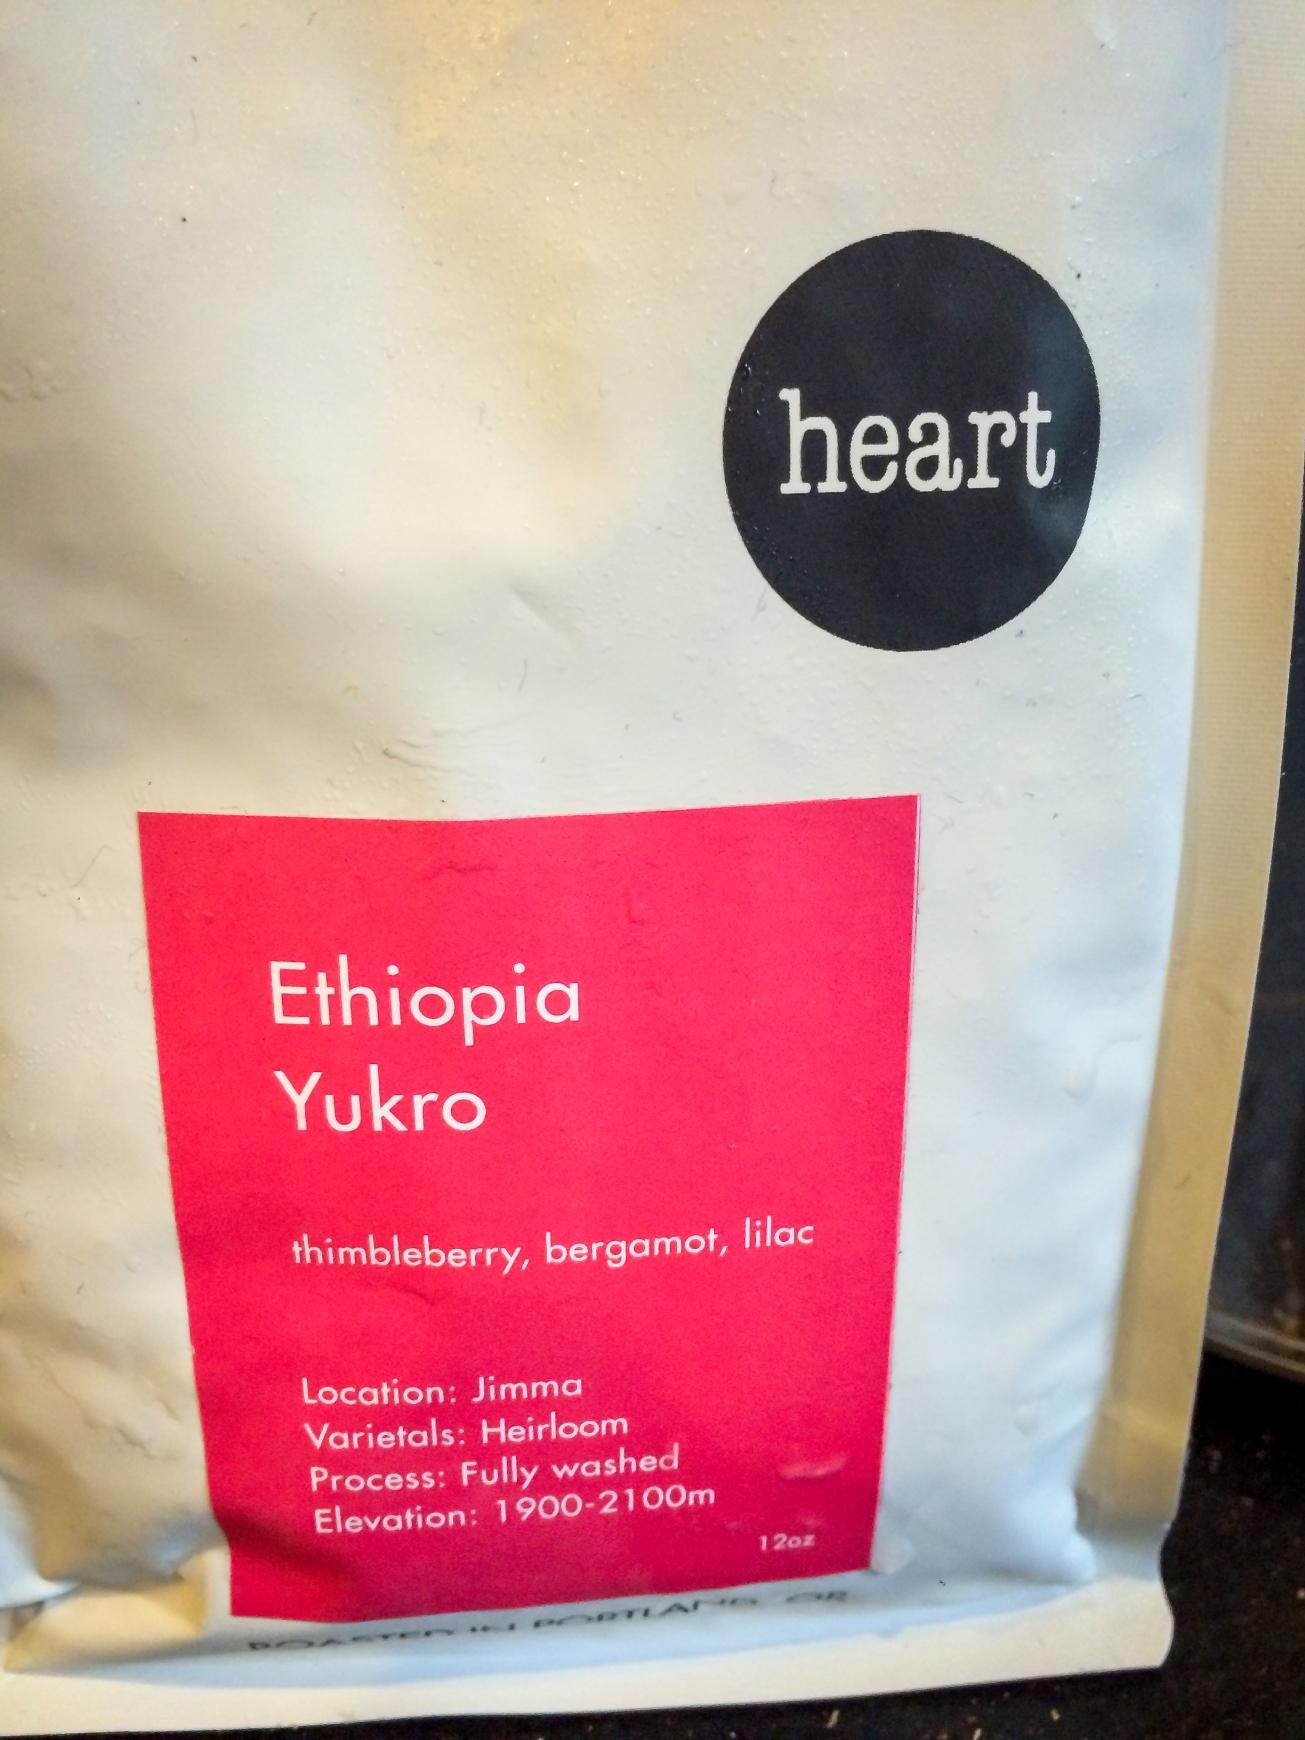 Heart Roasters Ethiopia Yukro